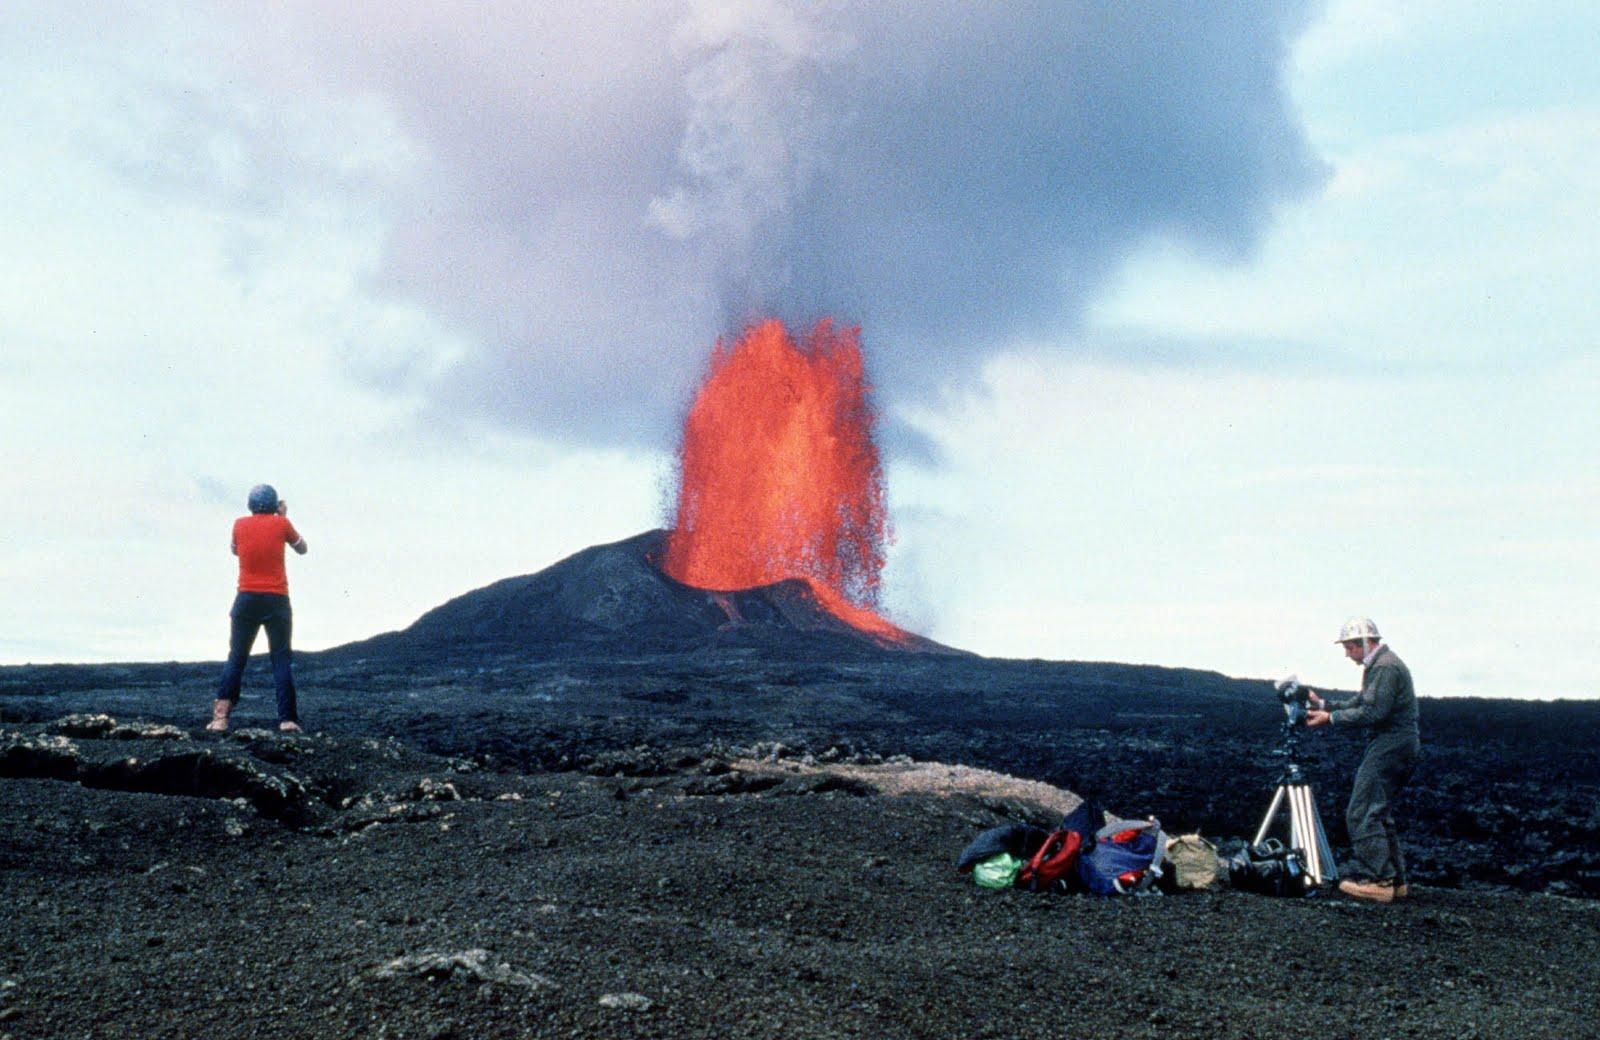 hawaii volcano kilauea eruption image Kilauea Not Erupting Viewing 1600x1040